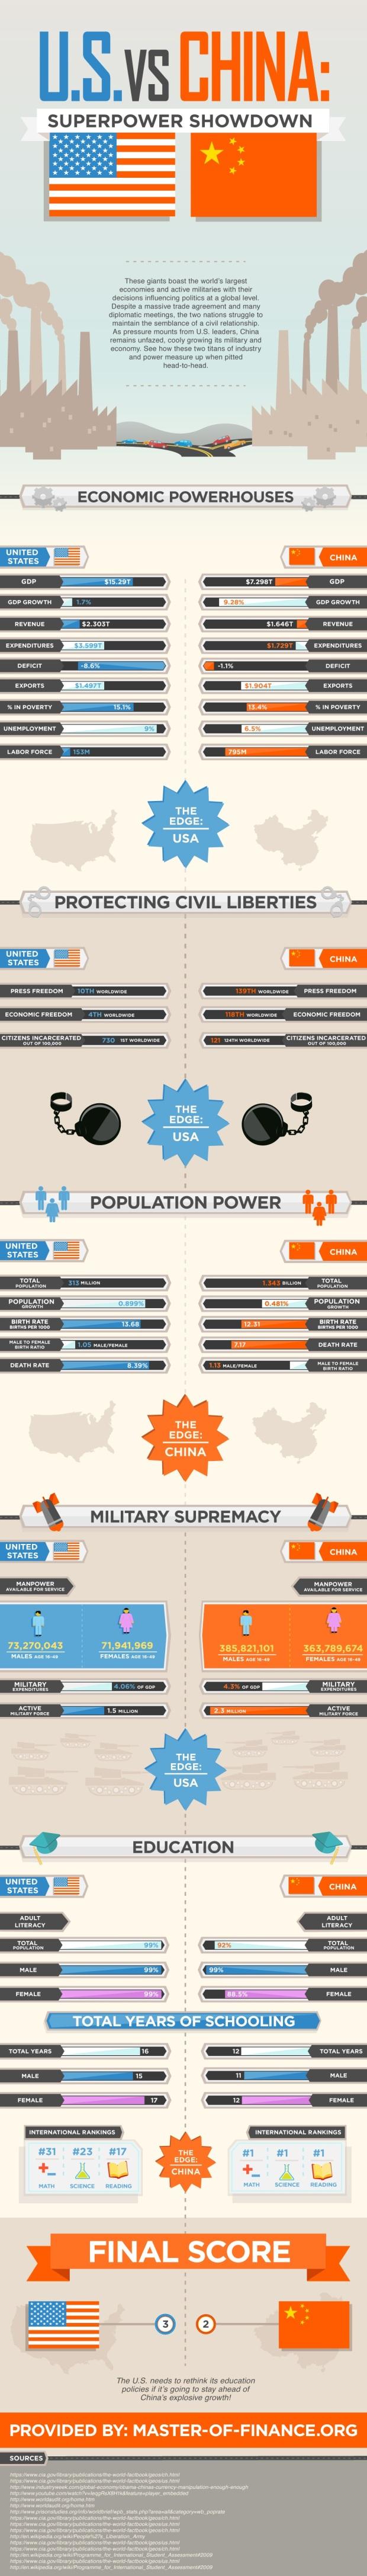 us-vs-china--superpower-showdown_508044fe69ce6